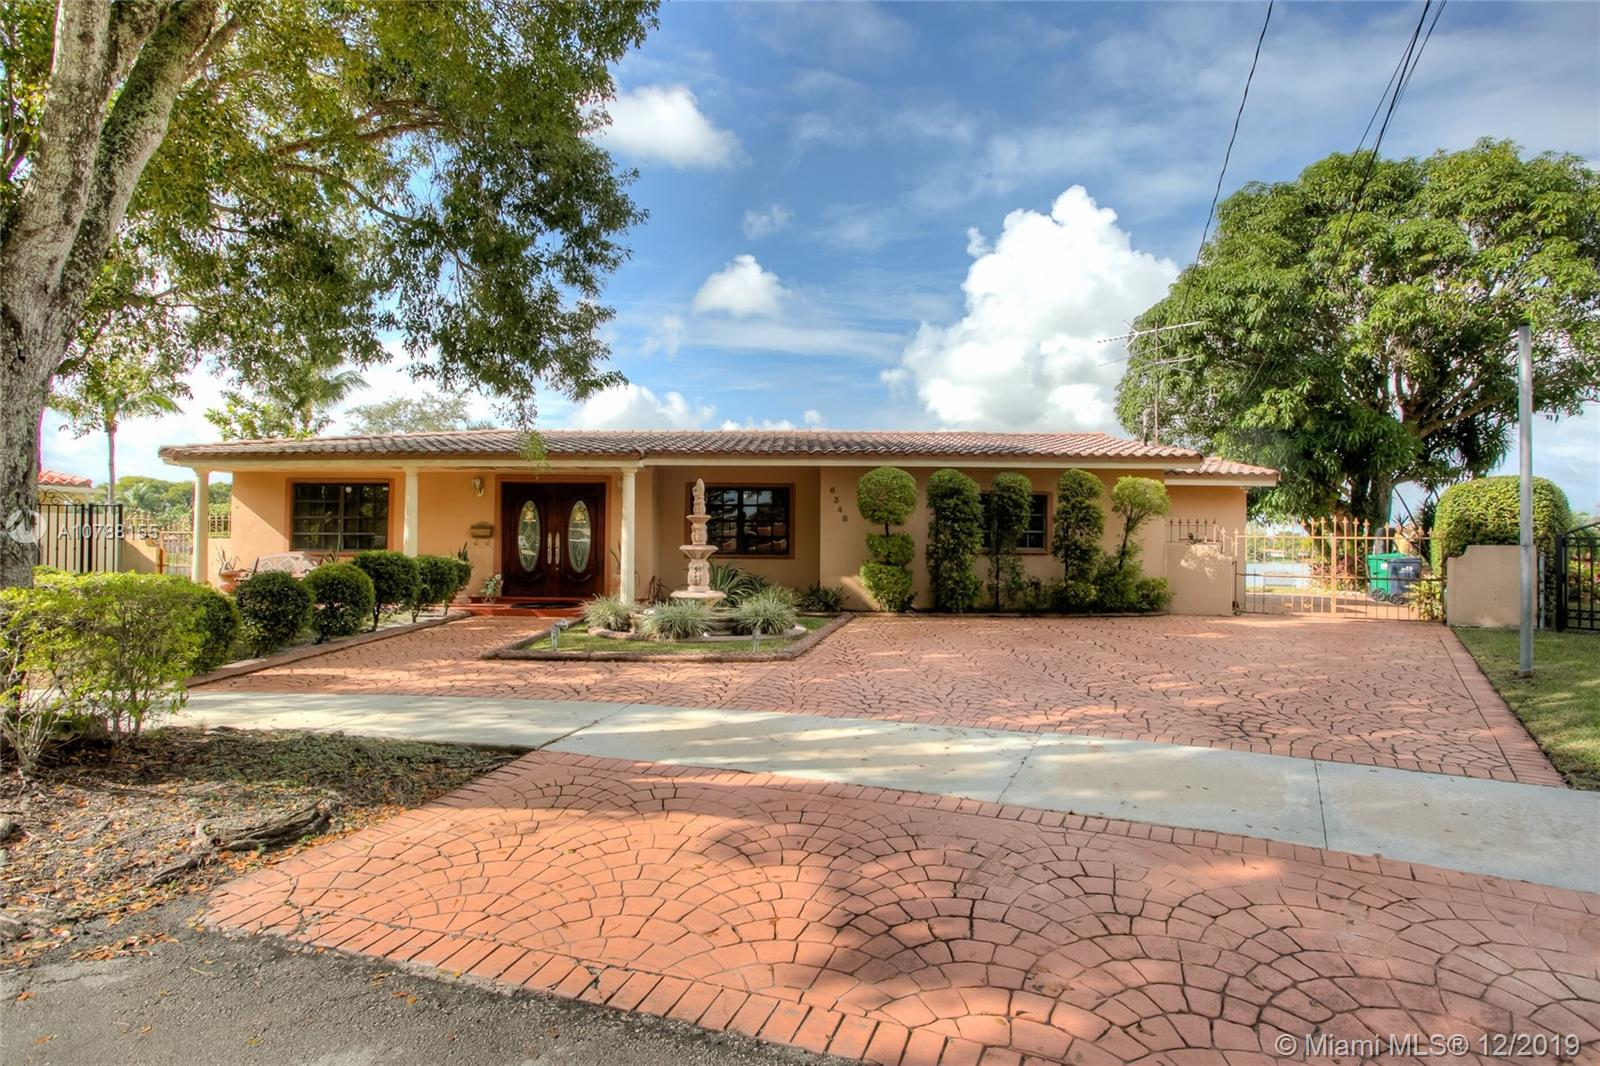 6348 Lake Patricia Dr, Miami Lakes, FL 33014